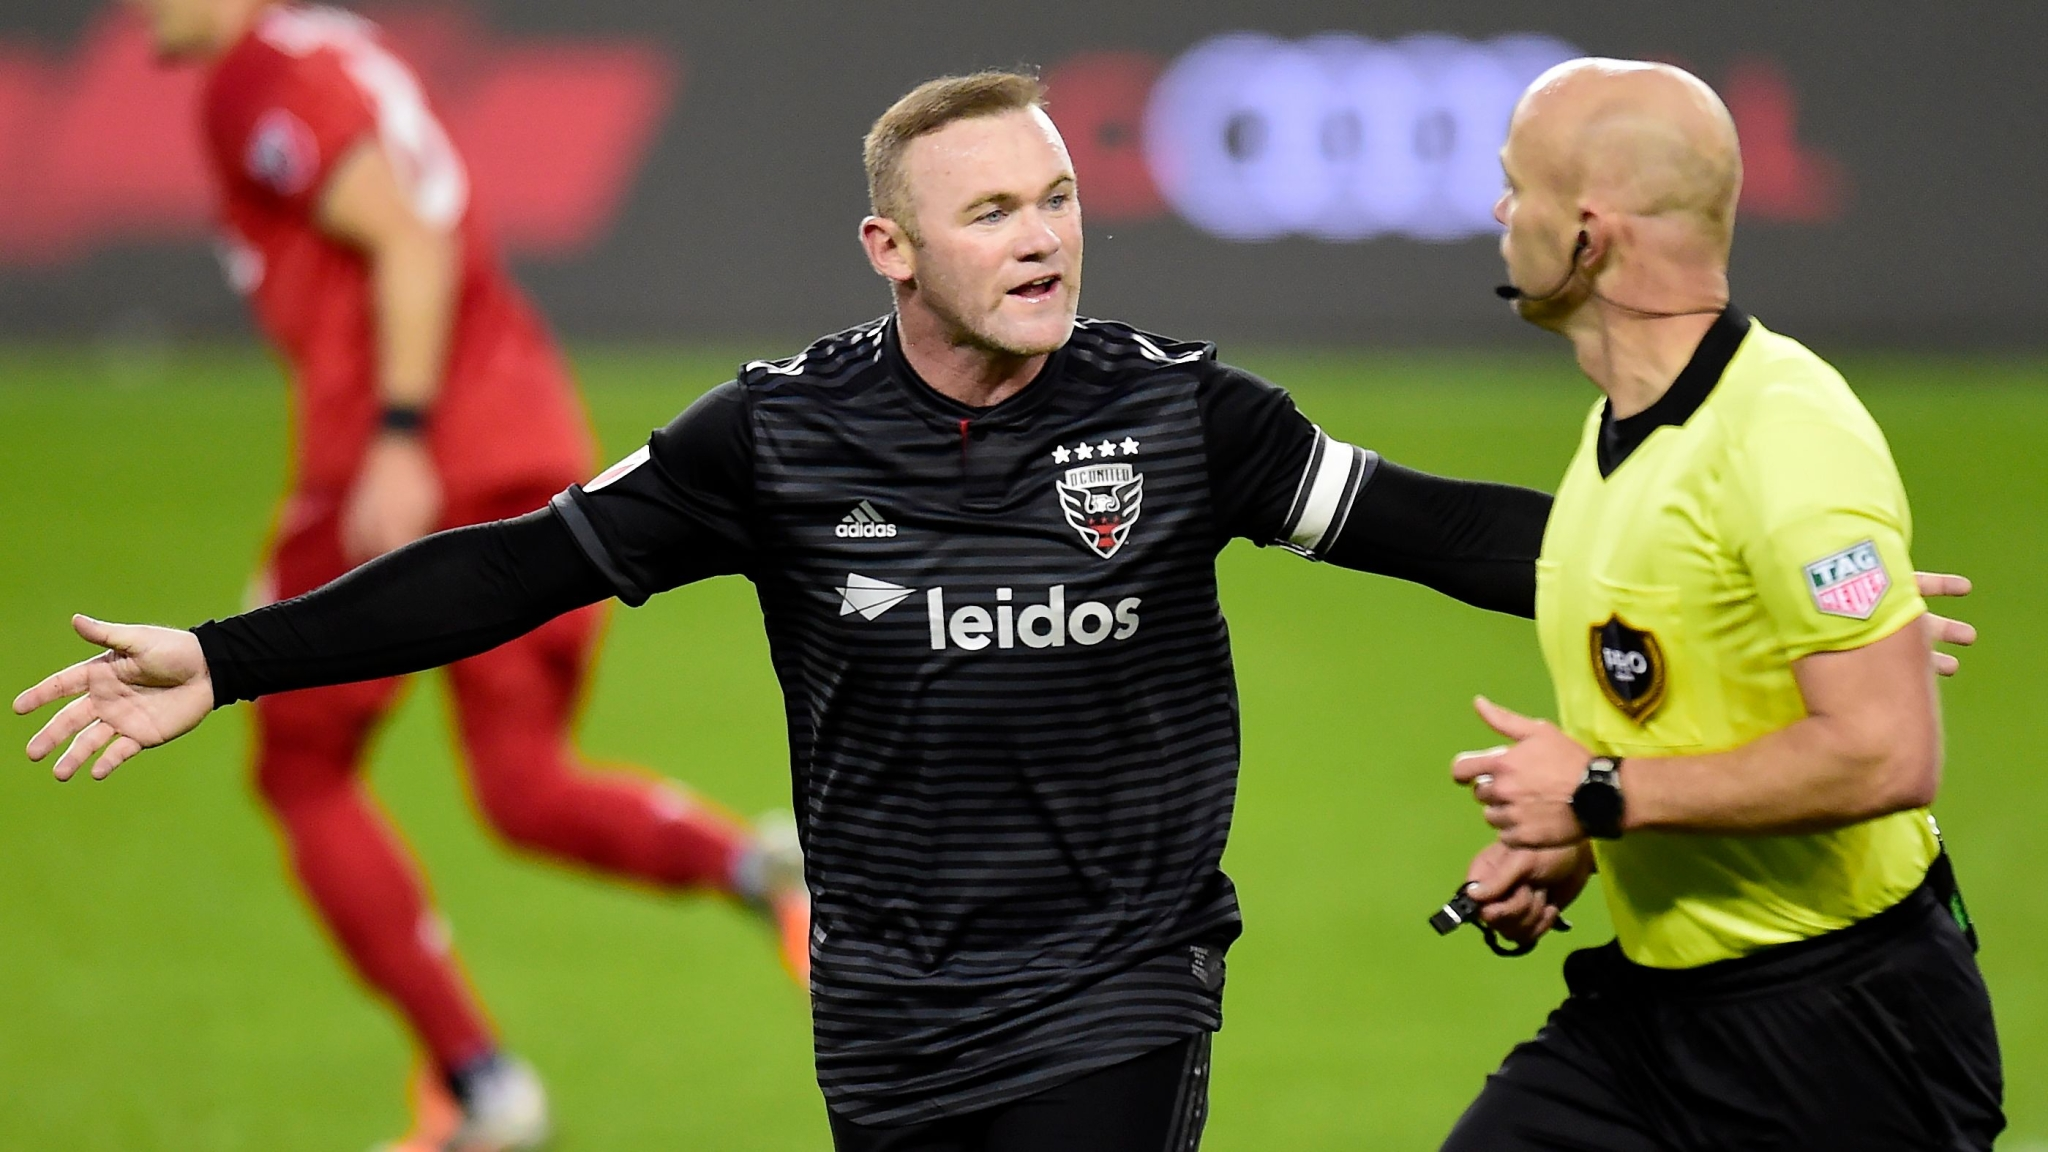 Toronto FC Beat DC United to End Wayne Rooney's MLS Career